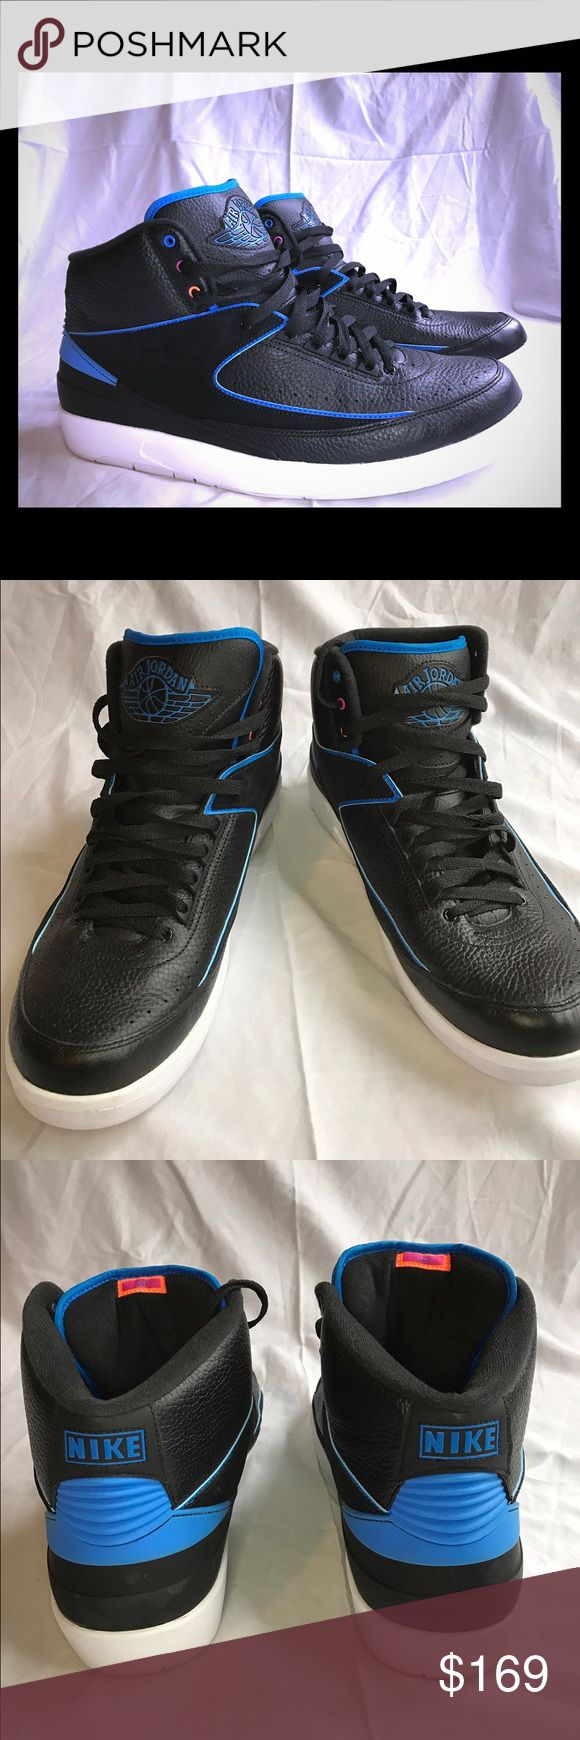 Jordan Retro 2 Jordan Retro 2  Slightly worn! No box, NO LOW BALL OFFERS, NO OFFERS IN COMMENT BOX Jordan Shoes Sneakers